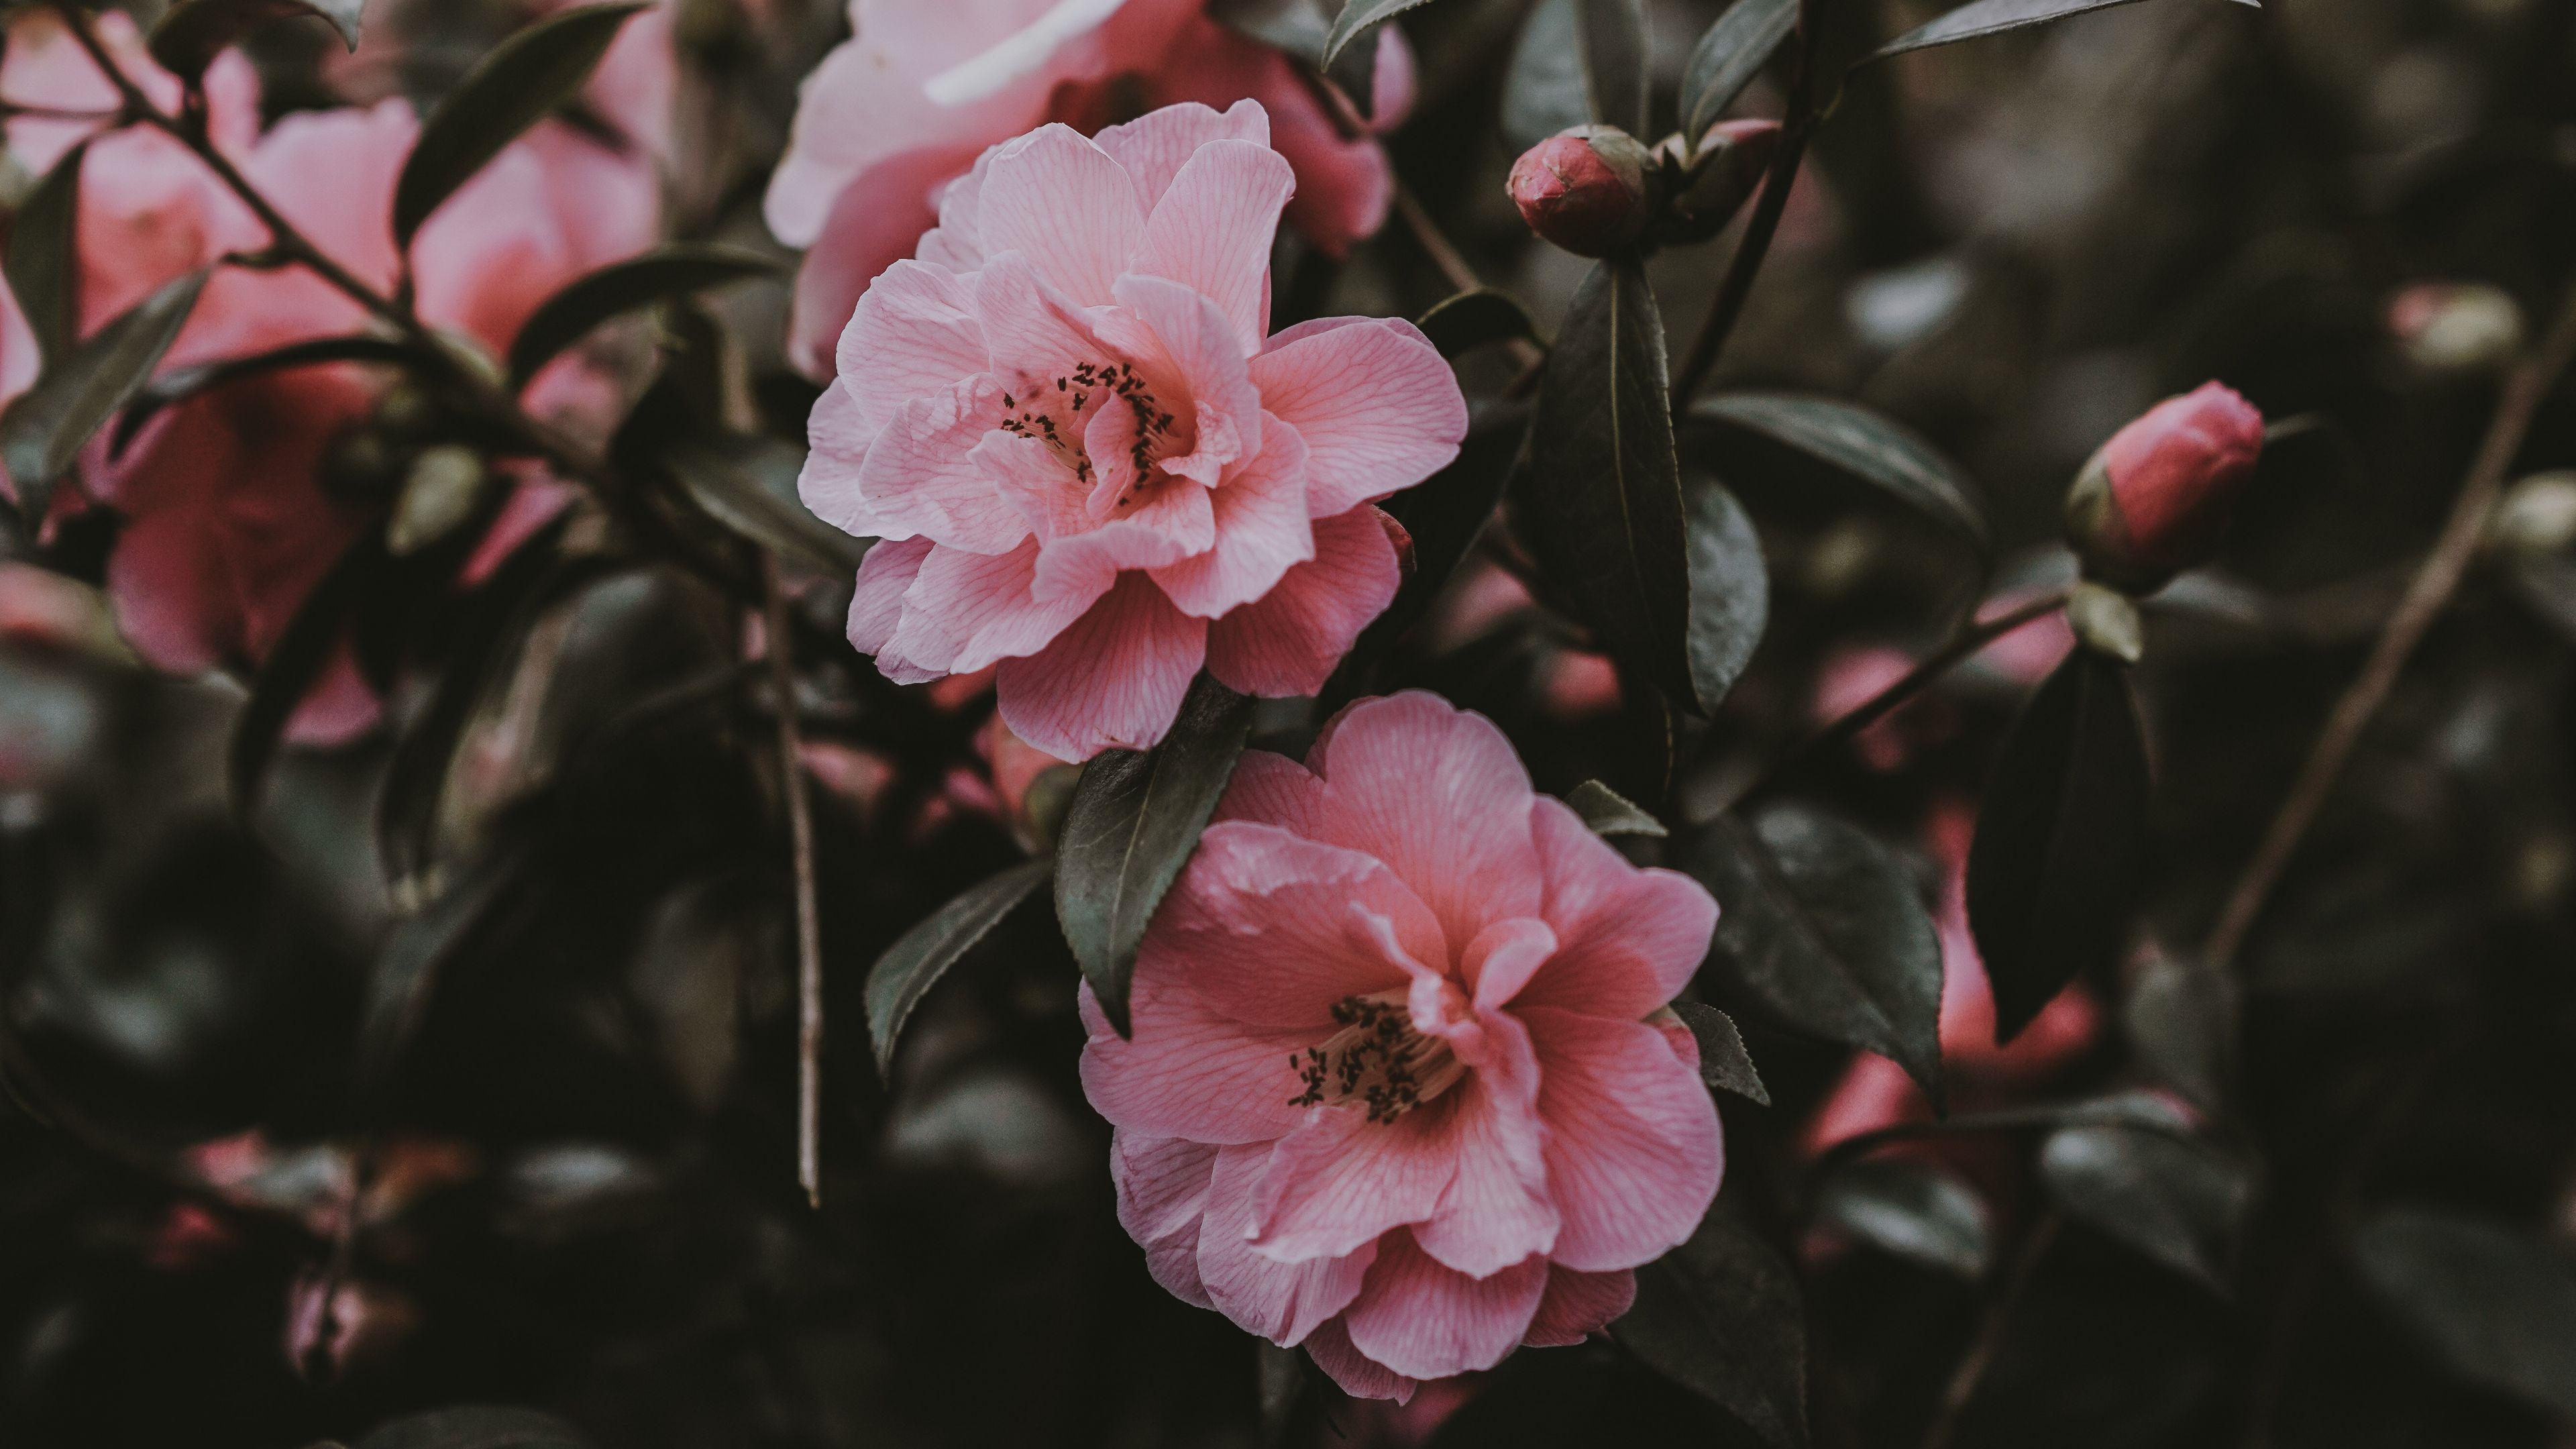 Pink Flowers Aesthetic Desktop Wallpapers - Wallpaper Cave